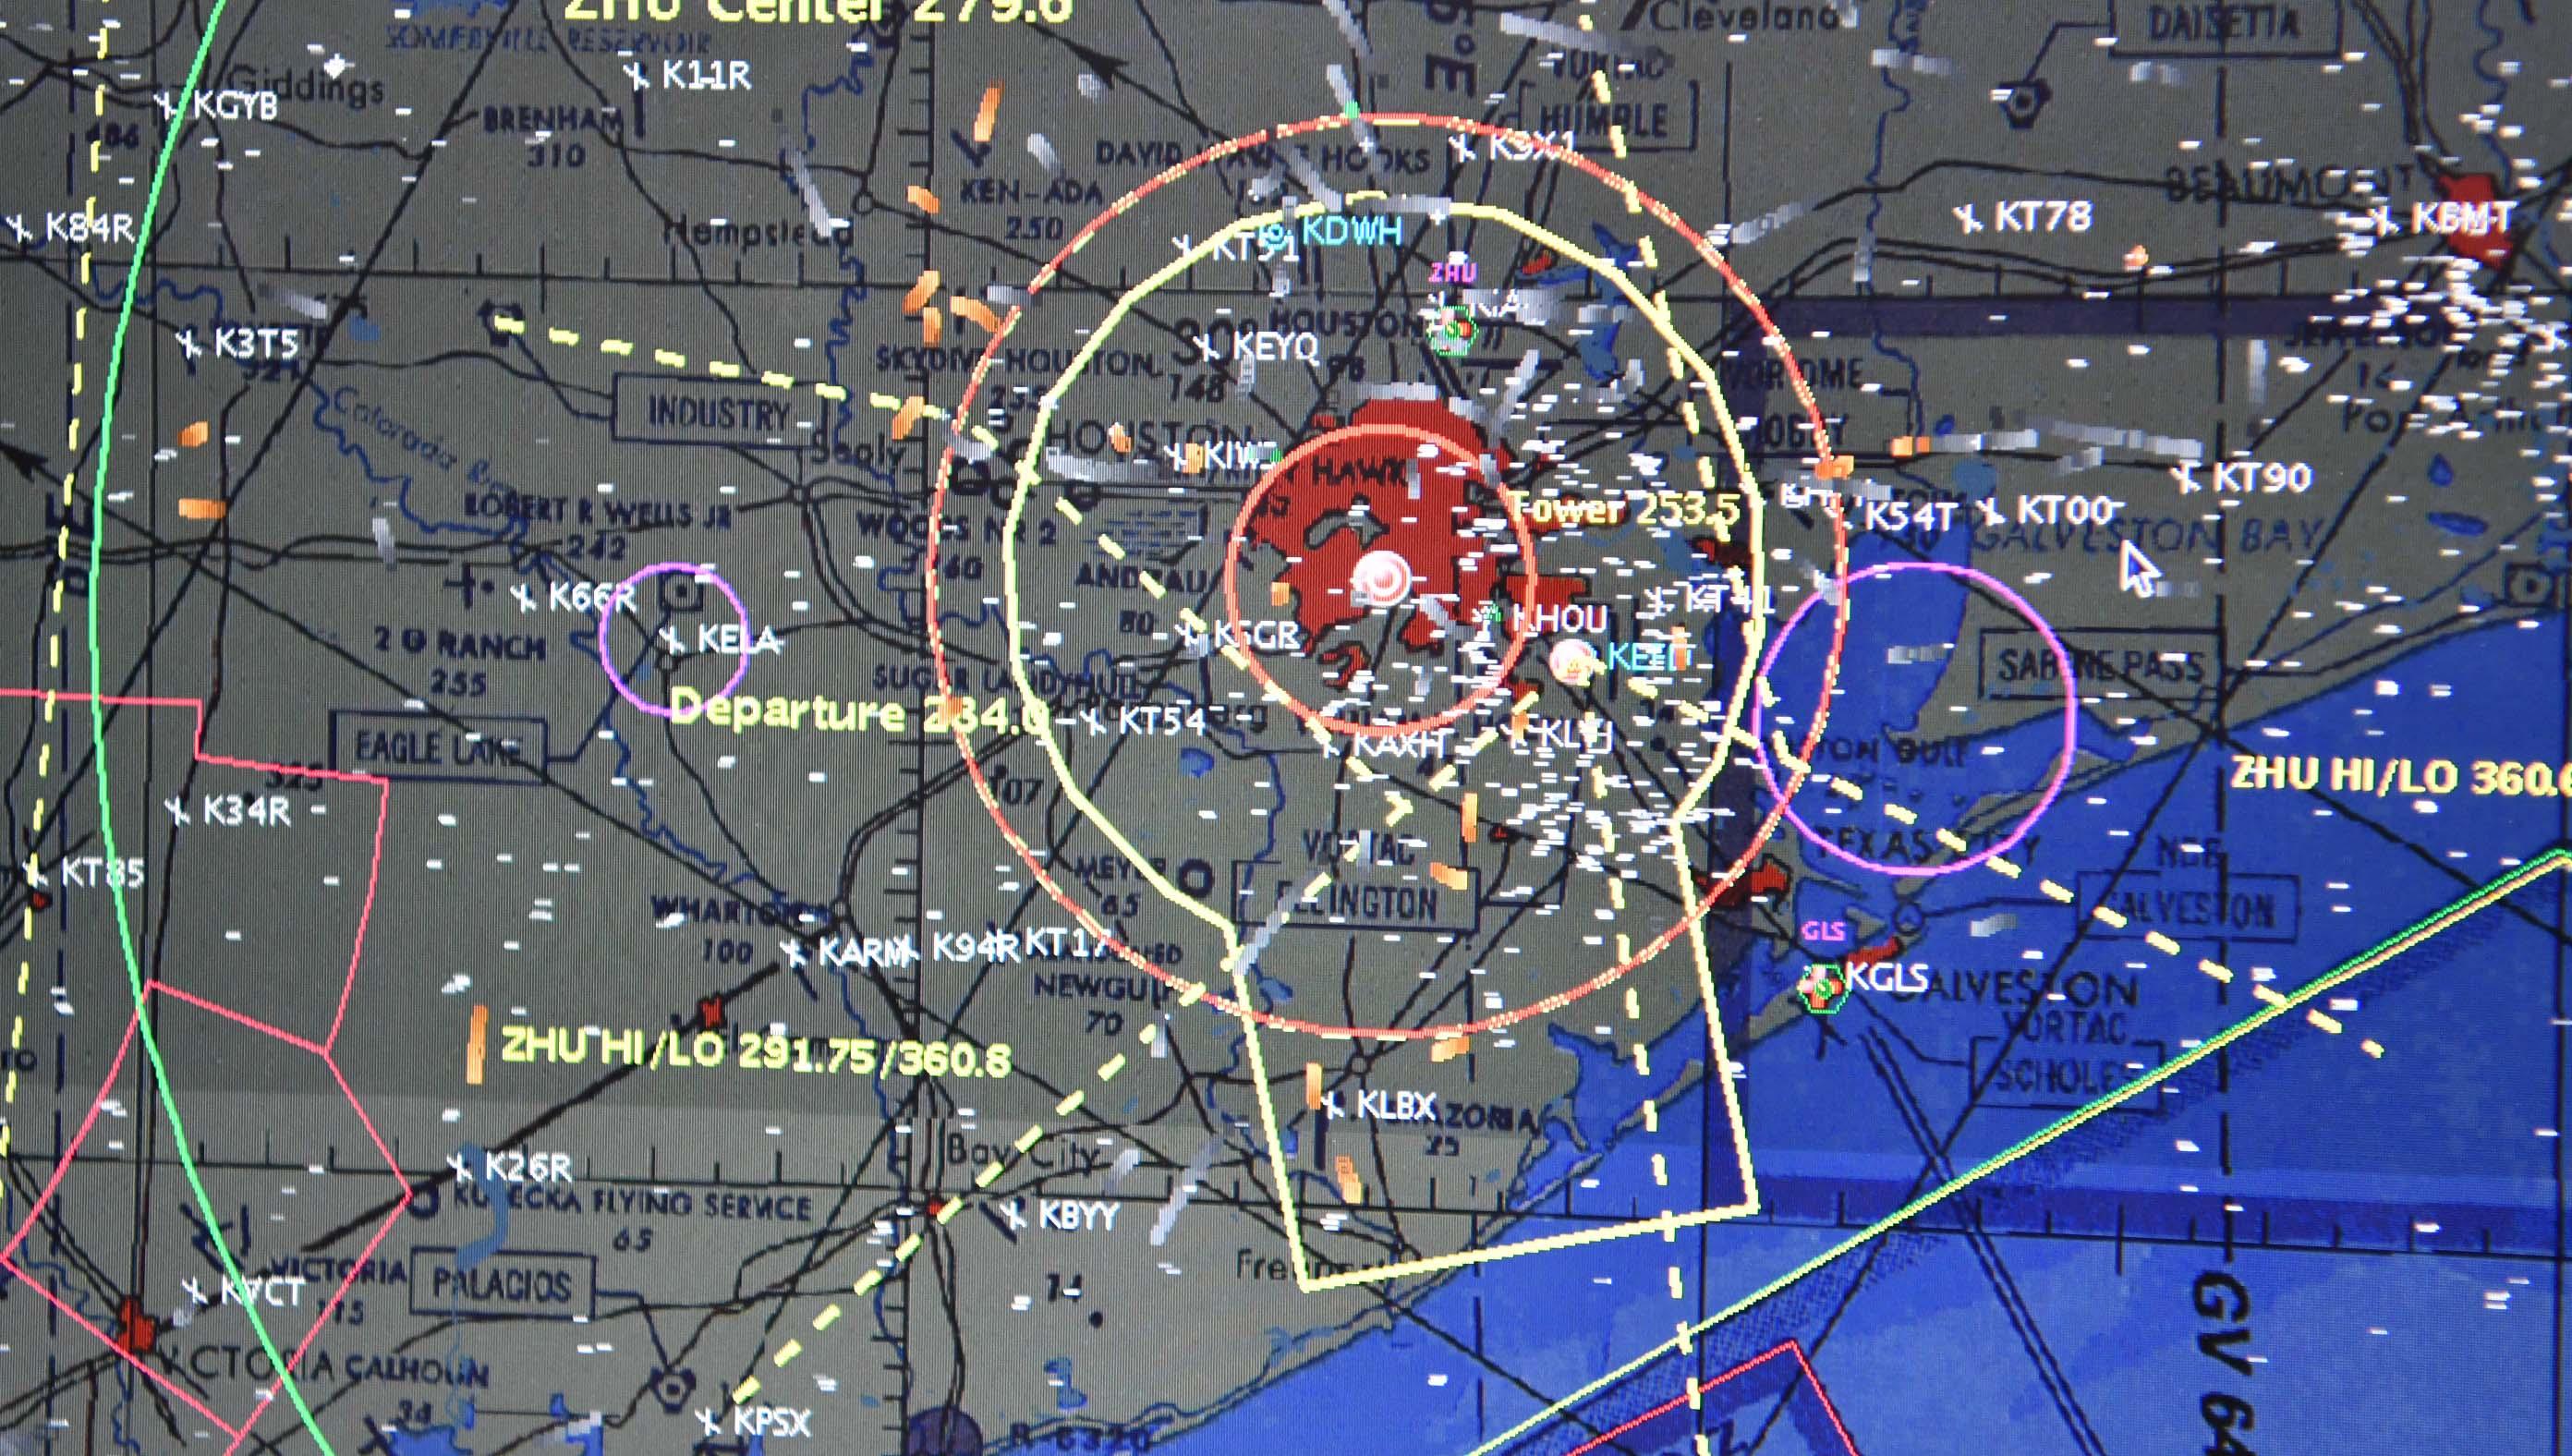 WADS keeps airspace secure during Super Bowl LI